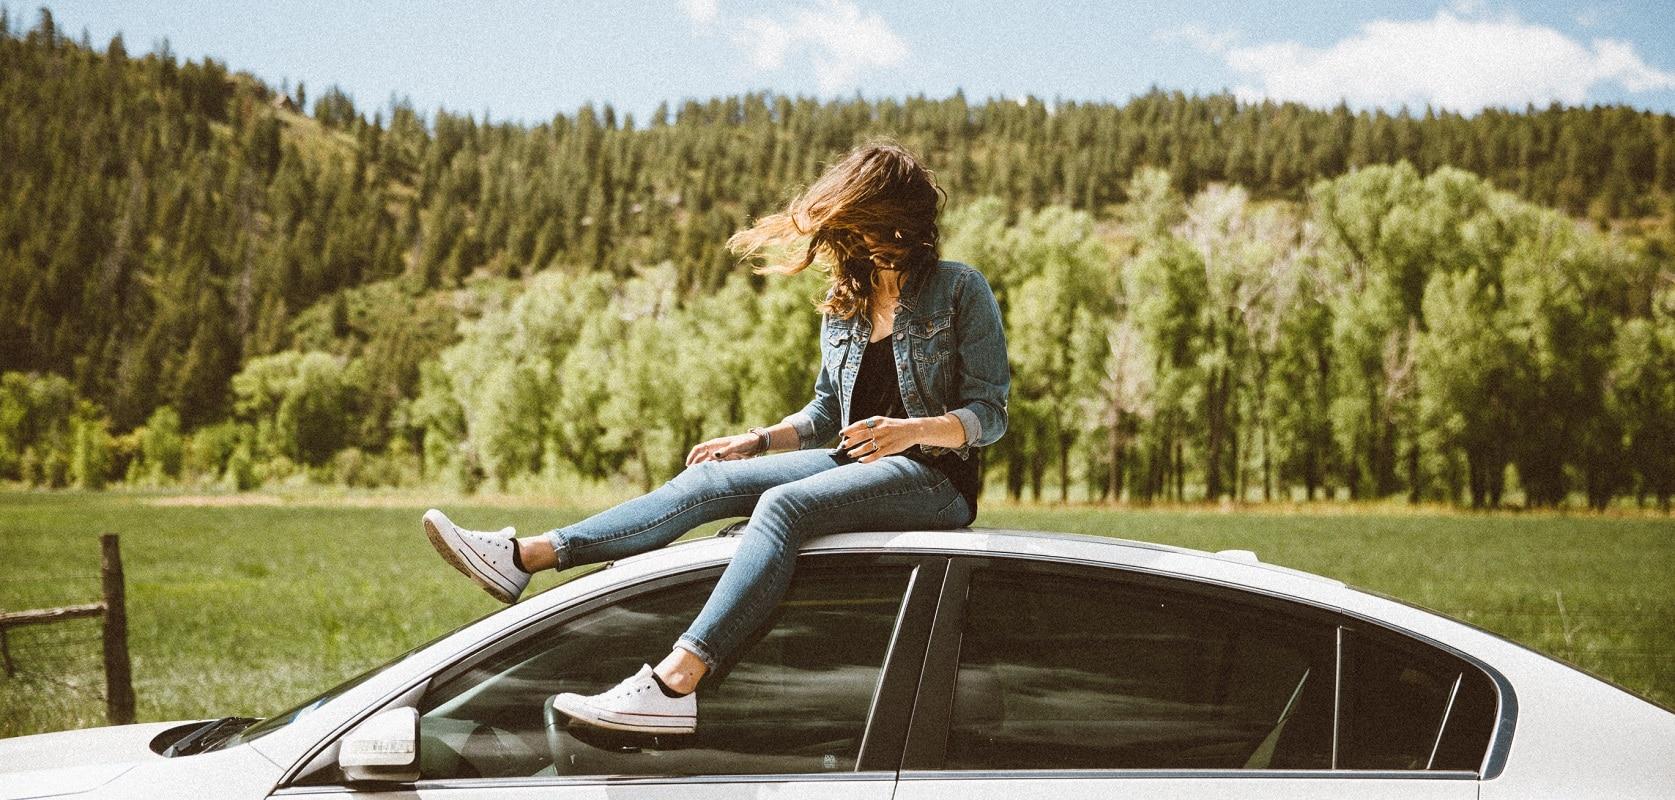 carte de debit location voiture Location de voiture : carte de débit ou carte de crédit ?